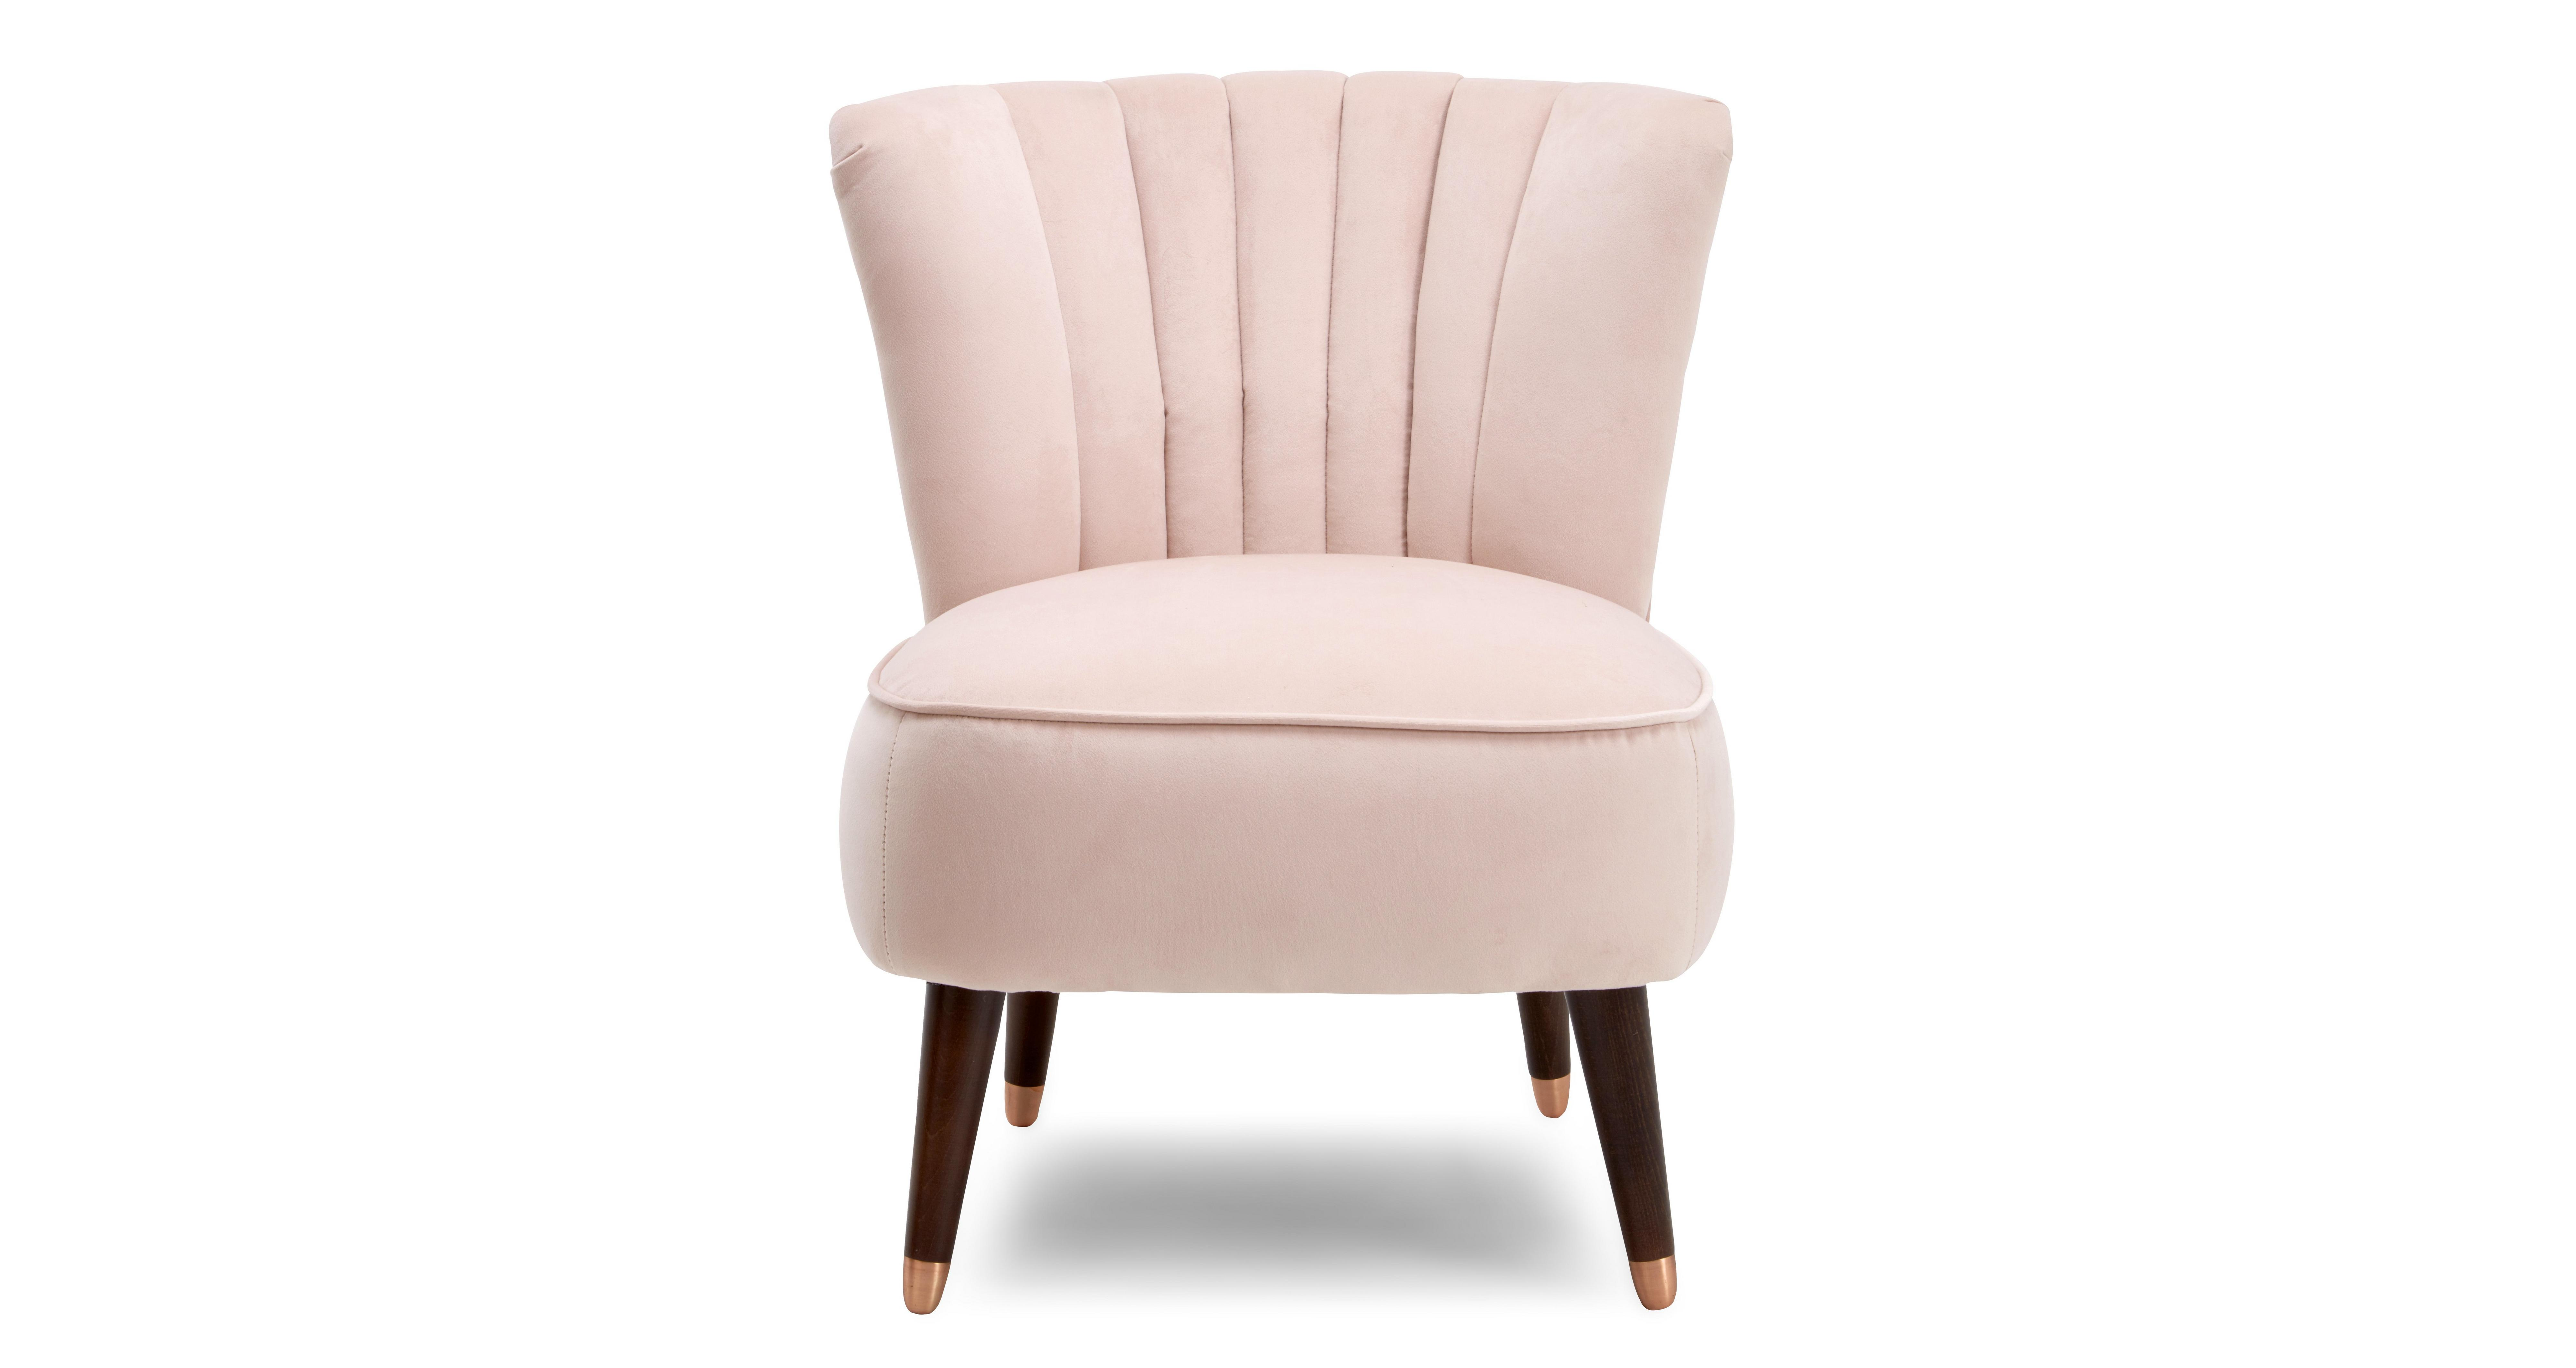 Wondrous Bedroom Chairs Dfs Spain Inzonedesignstudio Interior Chair Design Inzonedesignstudiocom